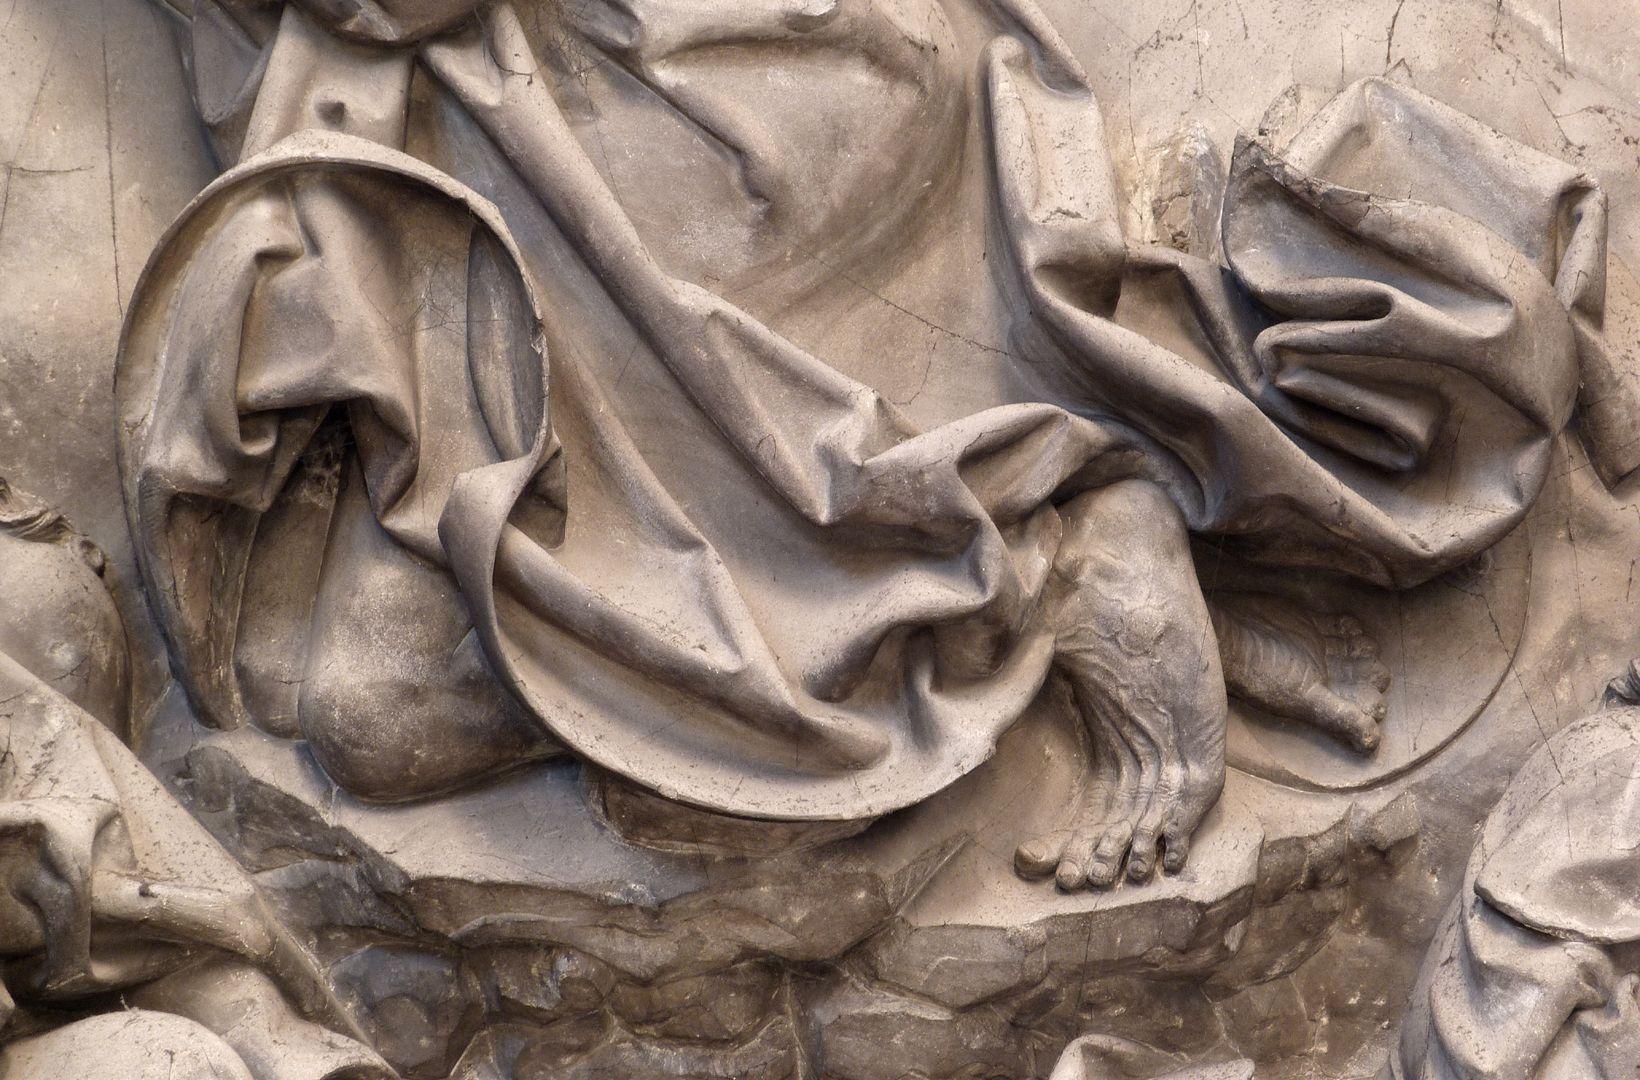 Volckamersche Gedächtnisstiftung, Reliefplatten Ölberggebet, ohrmuschelförmiges Faltenwerk am Gewand Christi